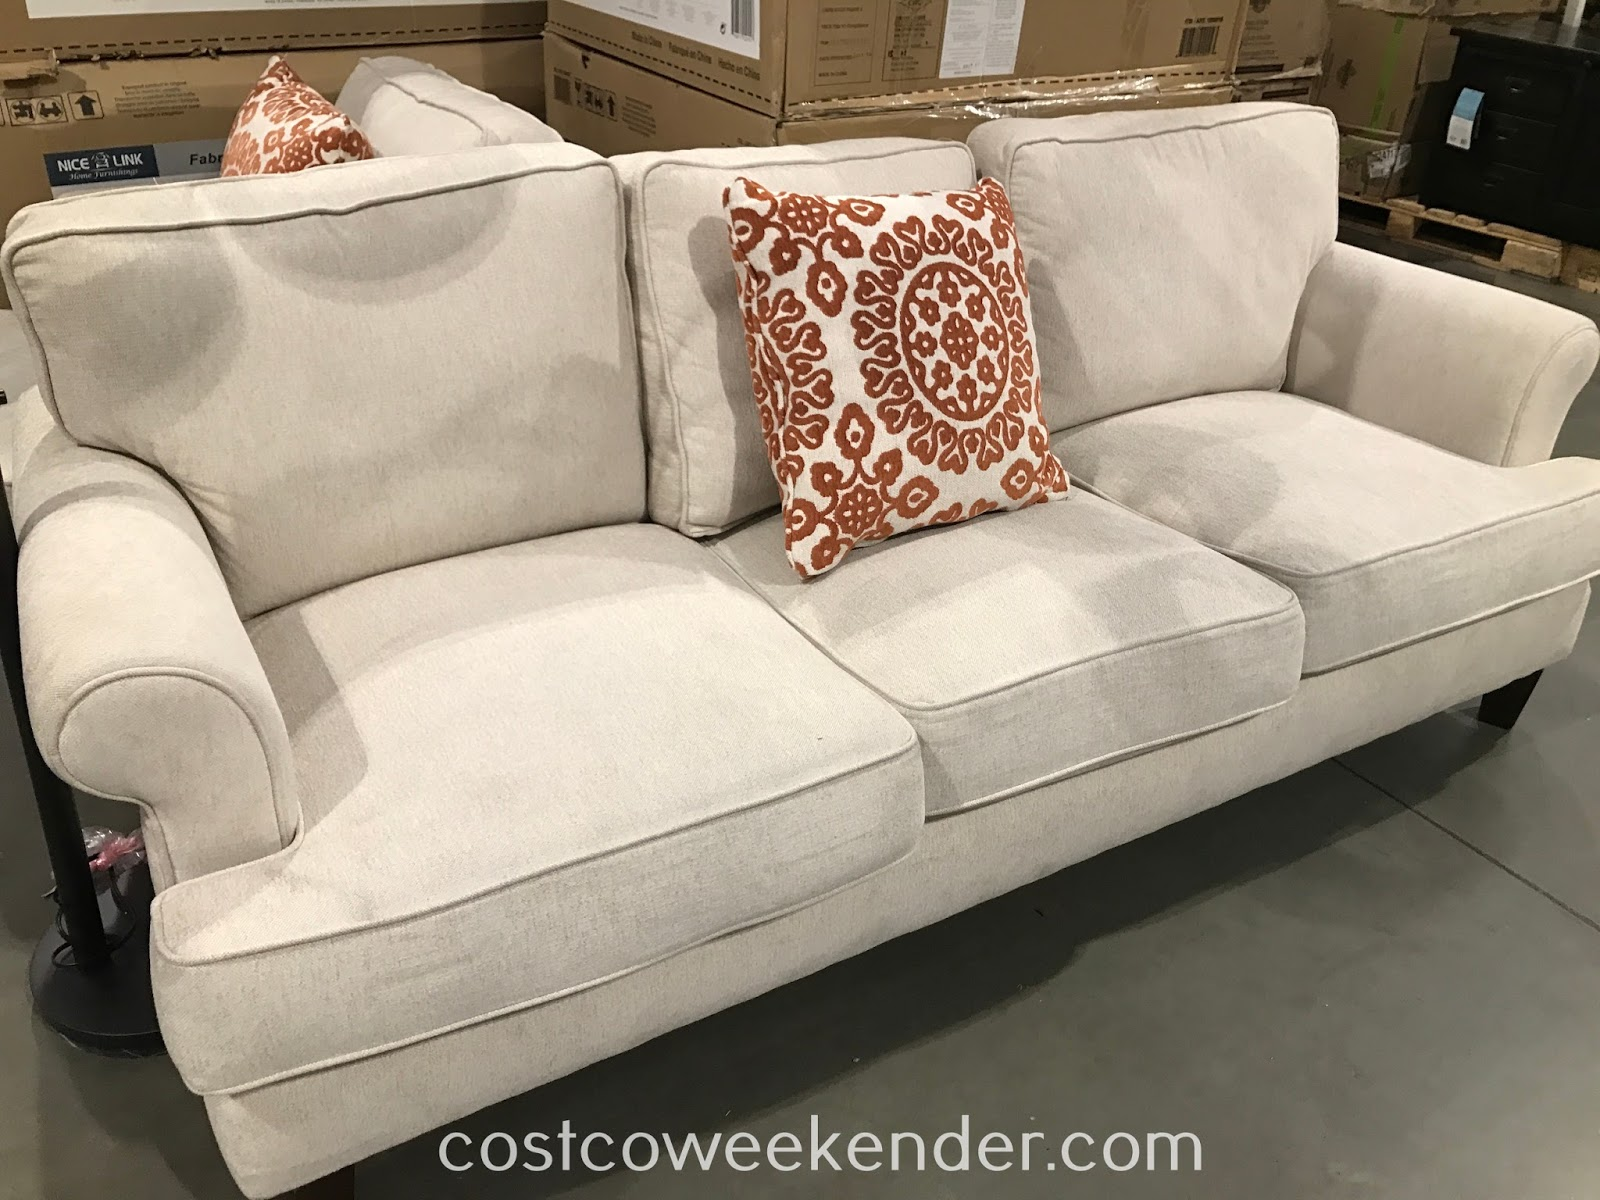 Sofa Costco Ca Scandinavian Style Sofas Uk Weekender   Making Every Weekend A